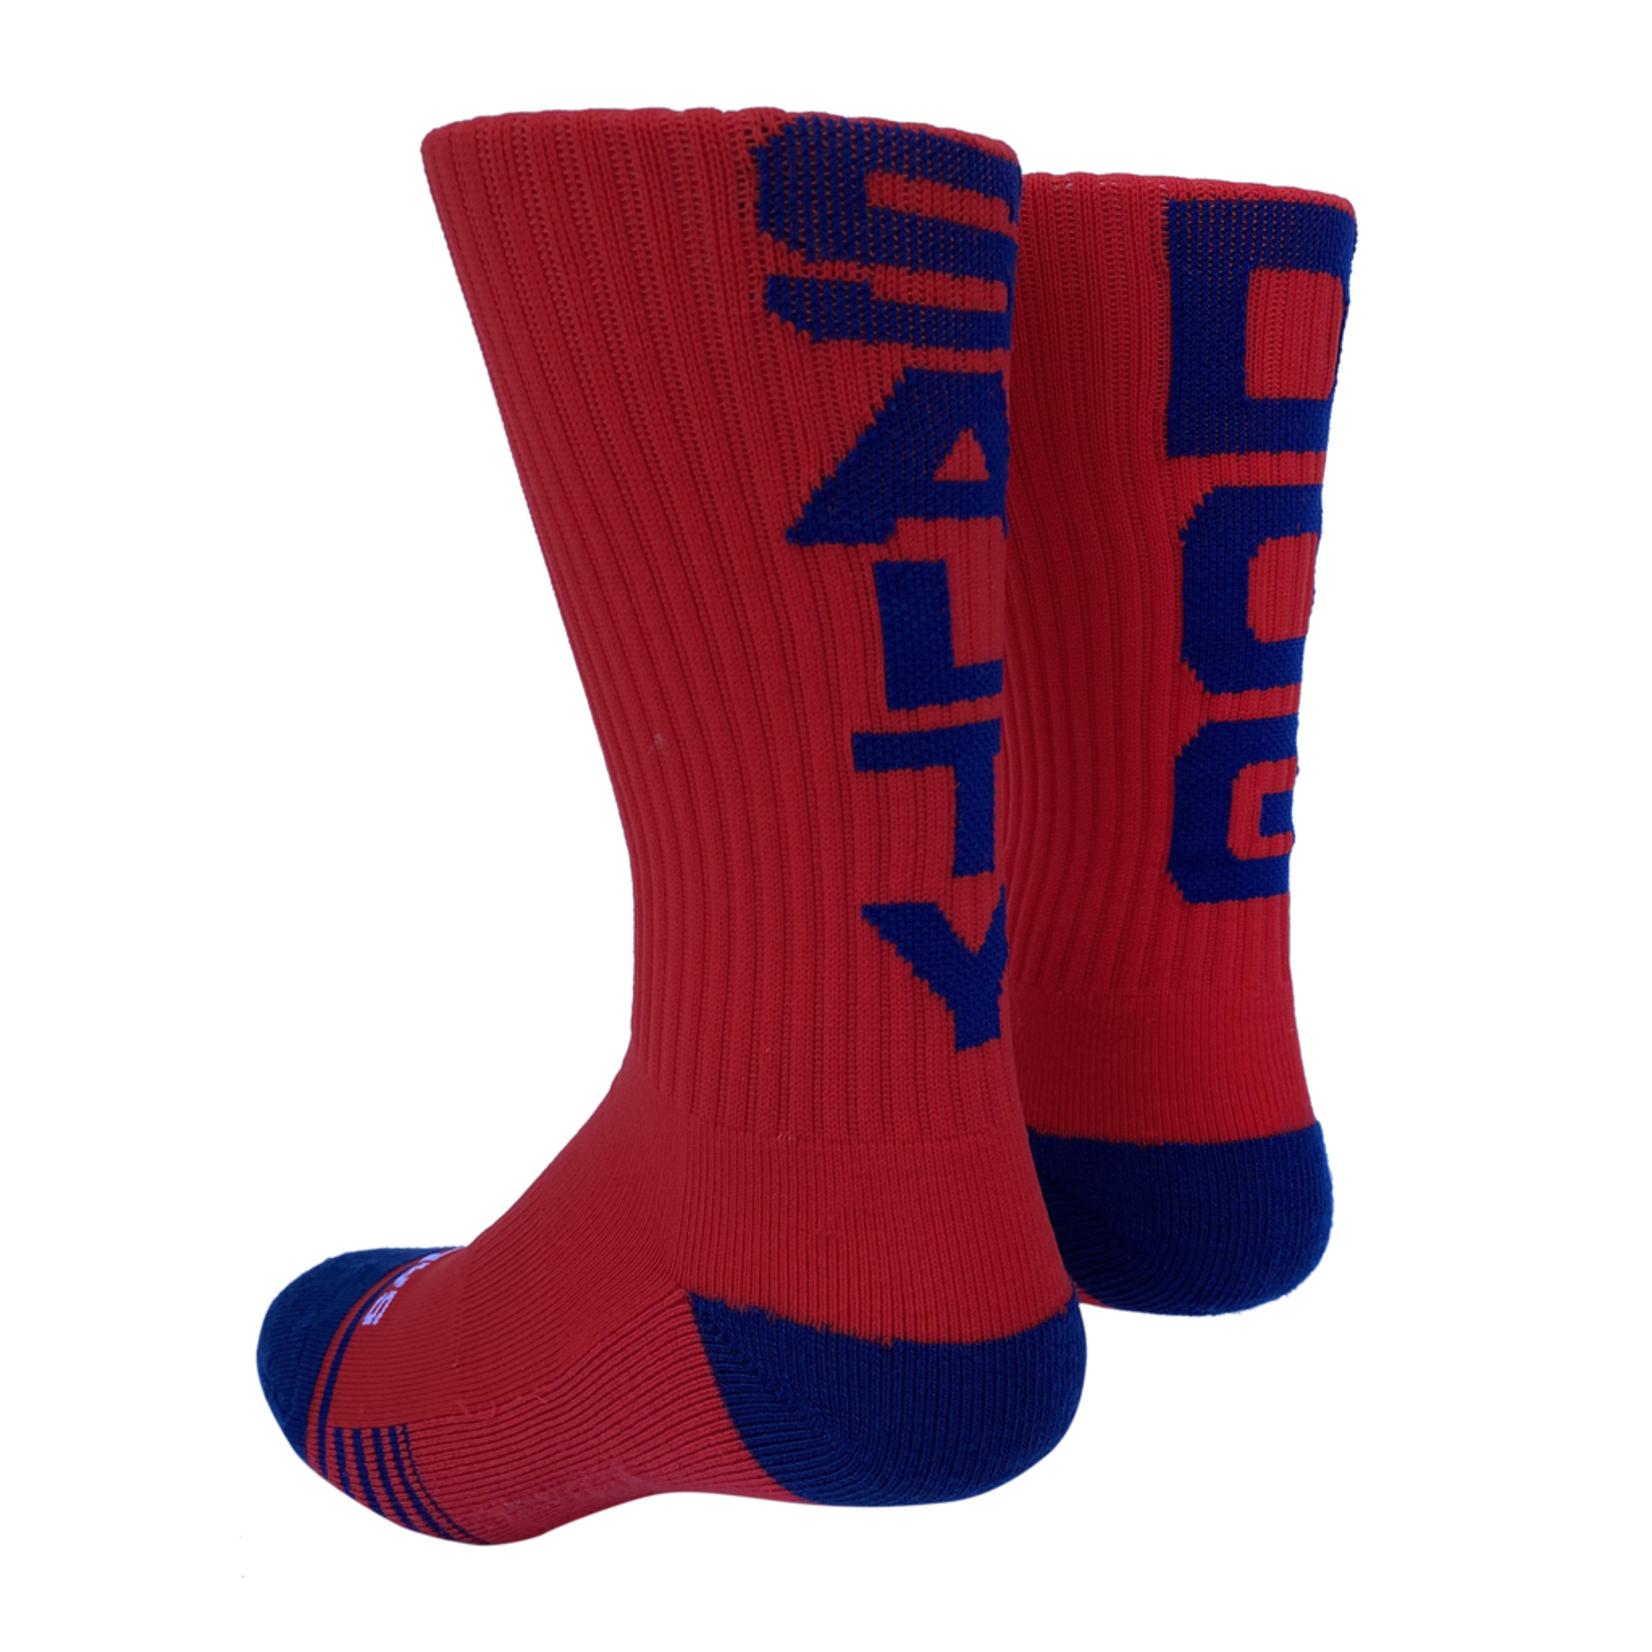 Socks-Salty Dog, Red/Navy